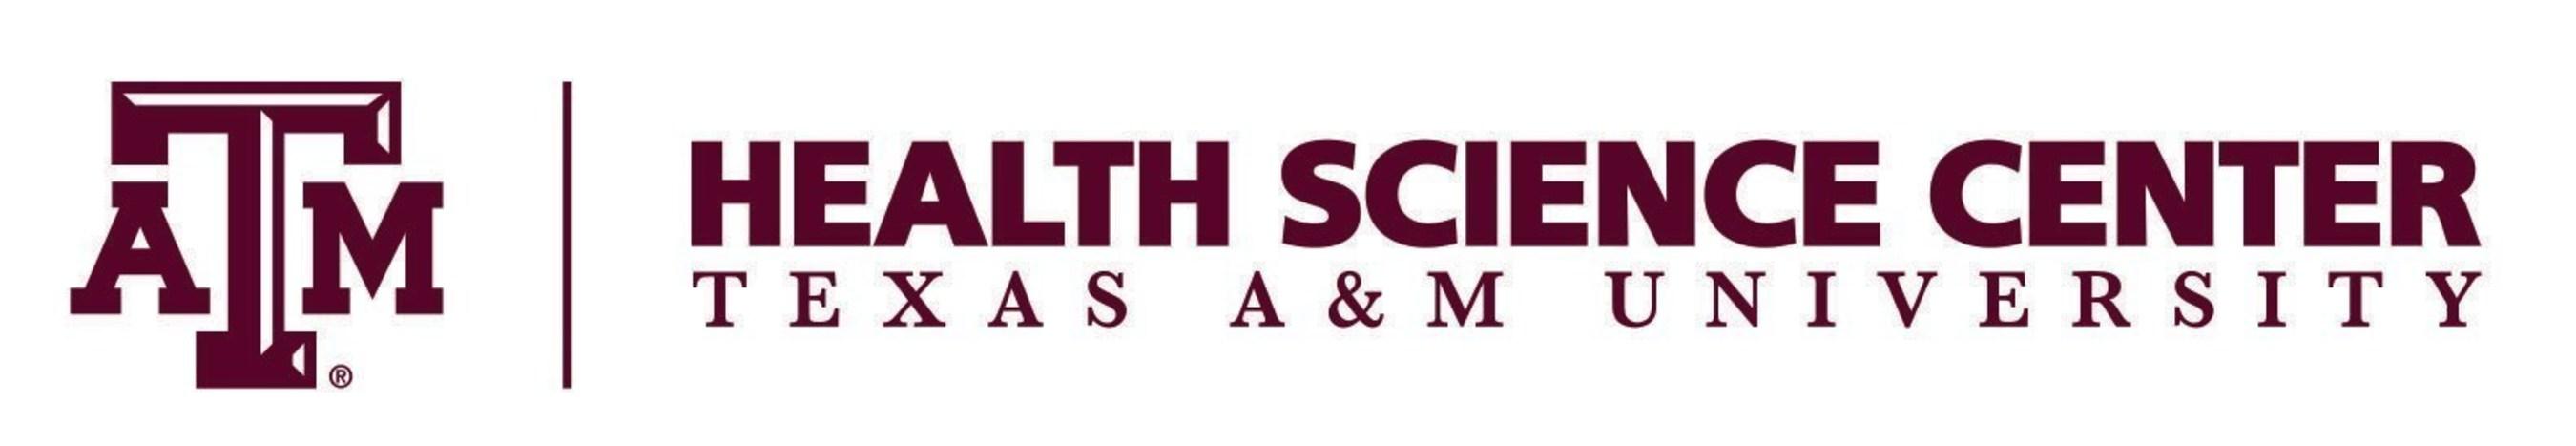 Texas A&M Health Science Center.